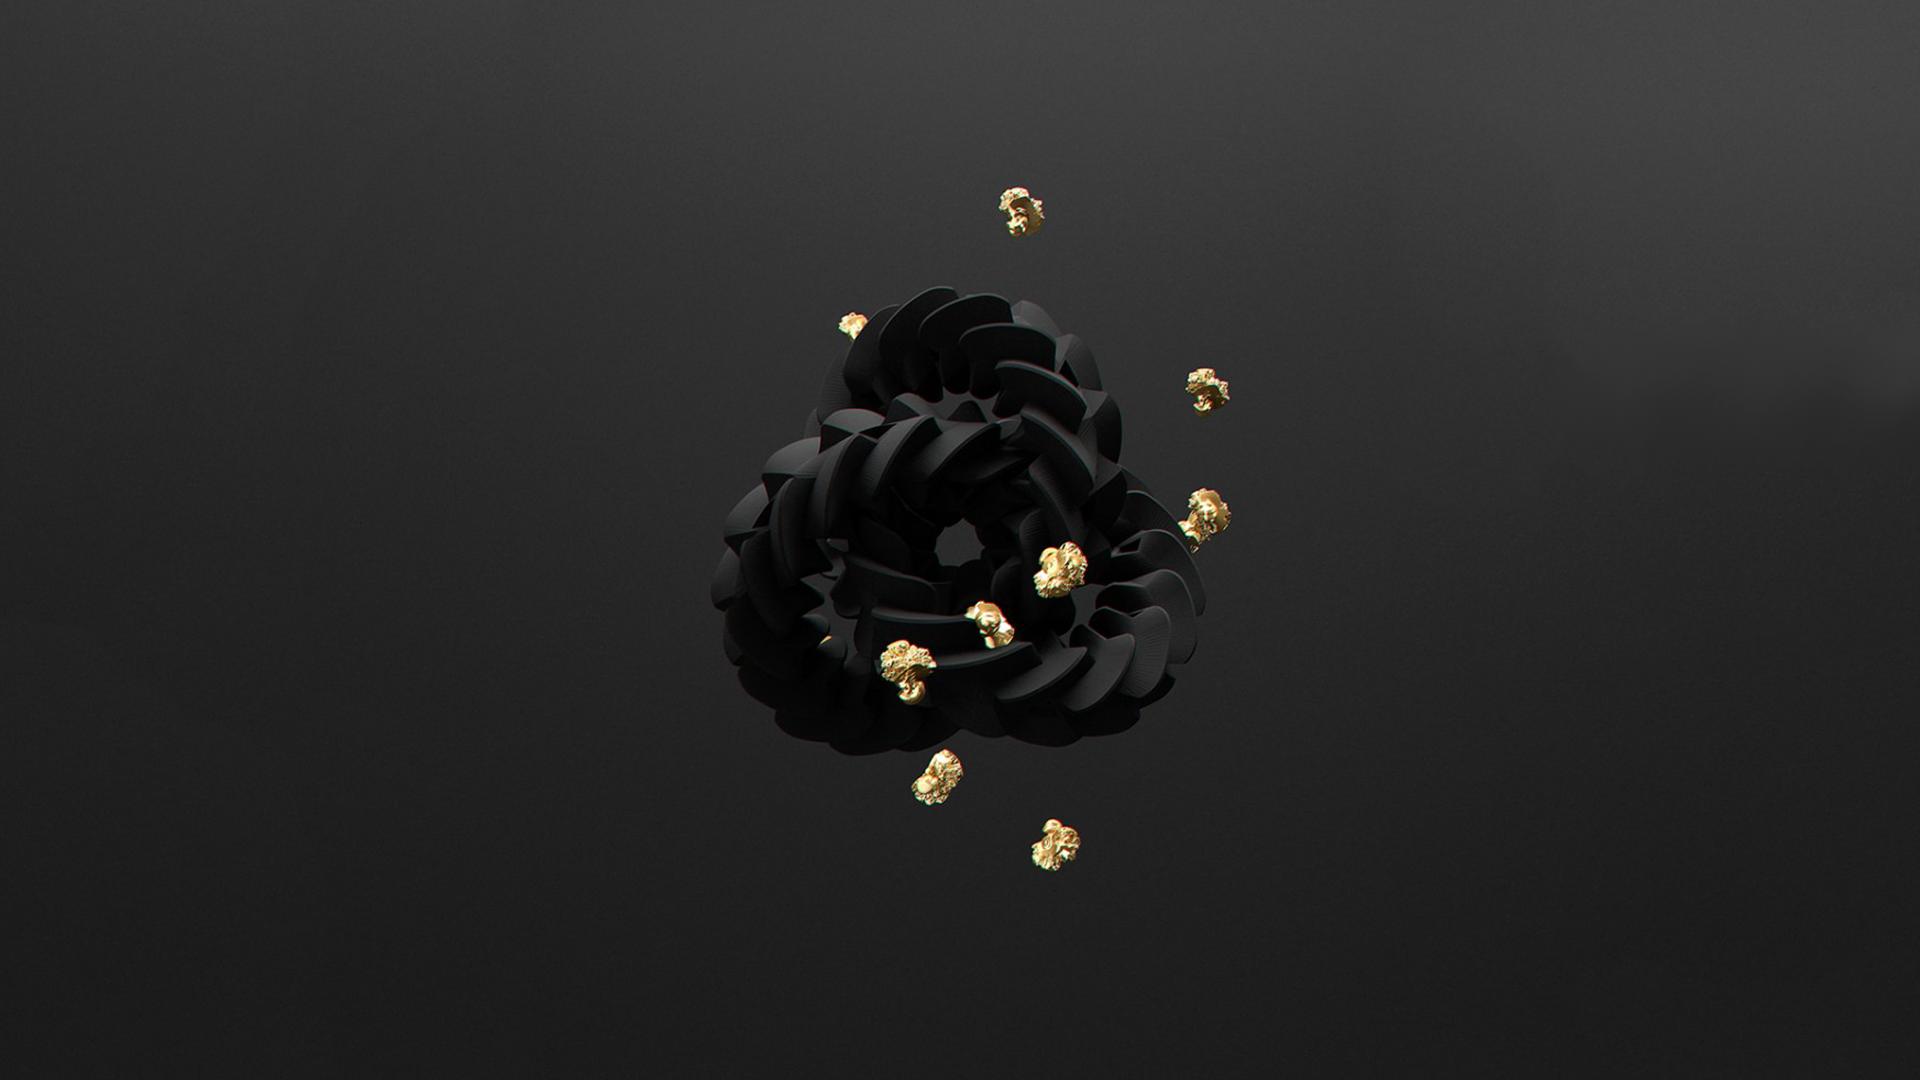 Black Illustration Minimalism Yellow Gold 3d Object Light Flower Lighting Darkness Jewellery Screenshot Computer Wallpaper Macro